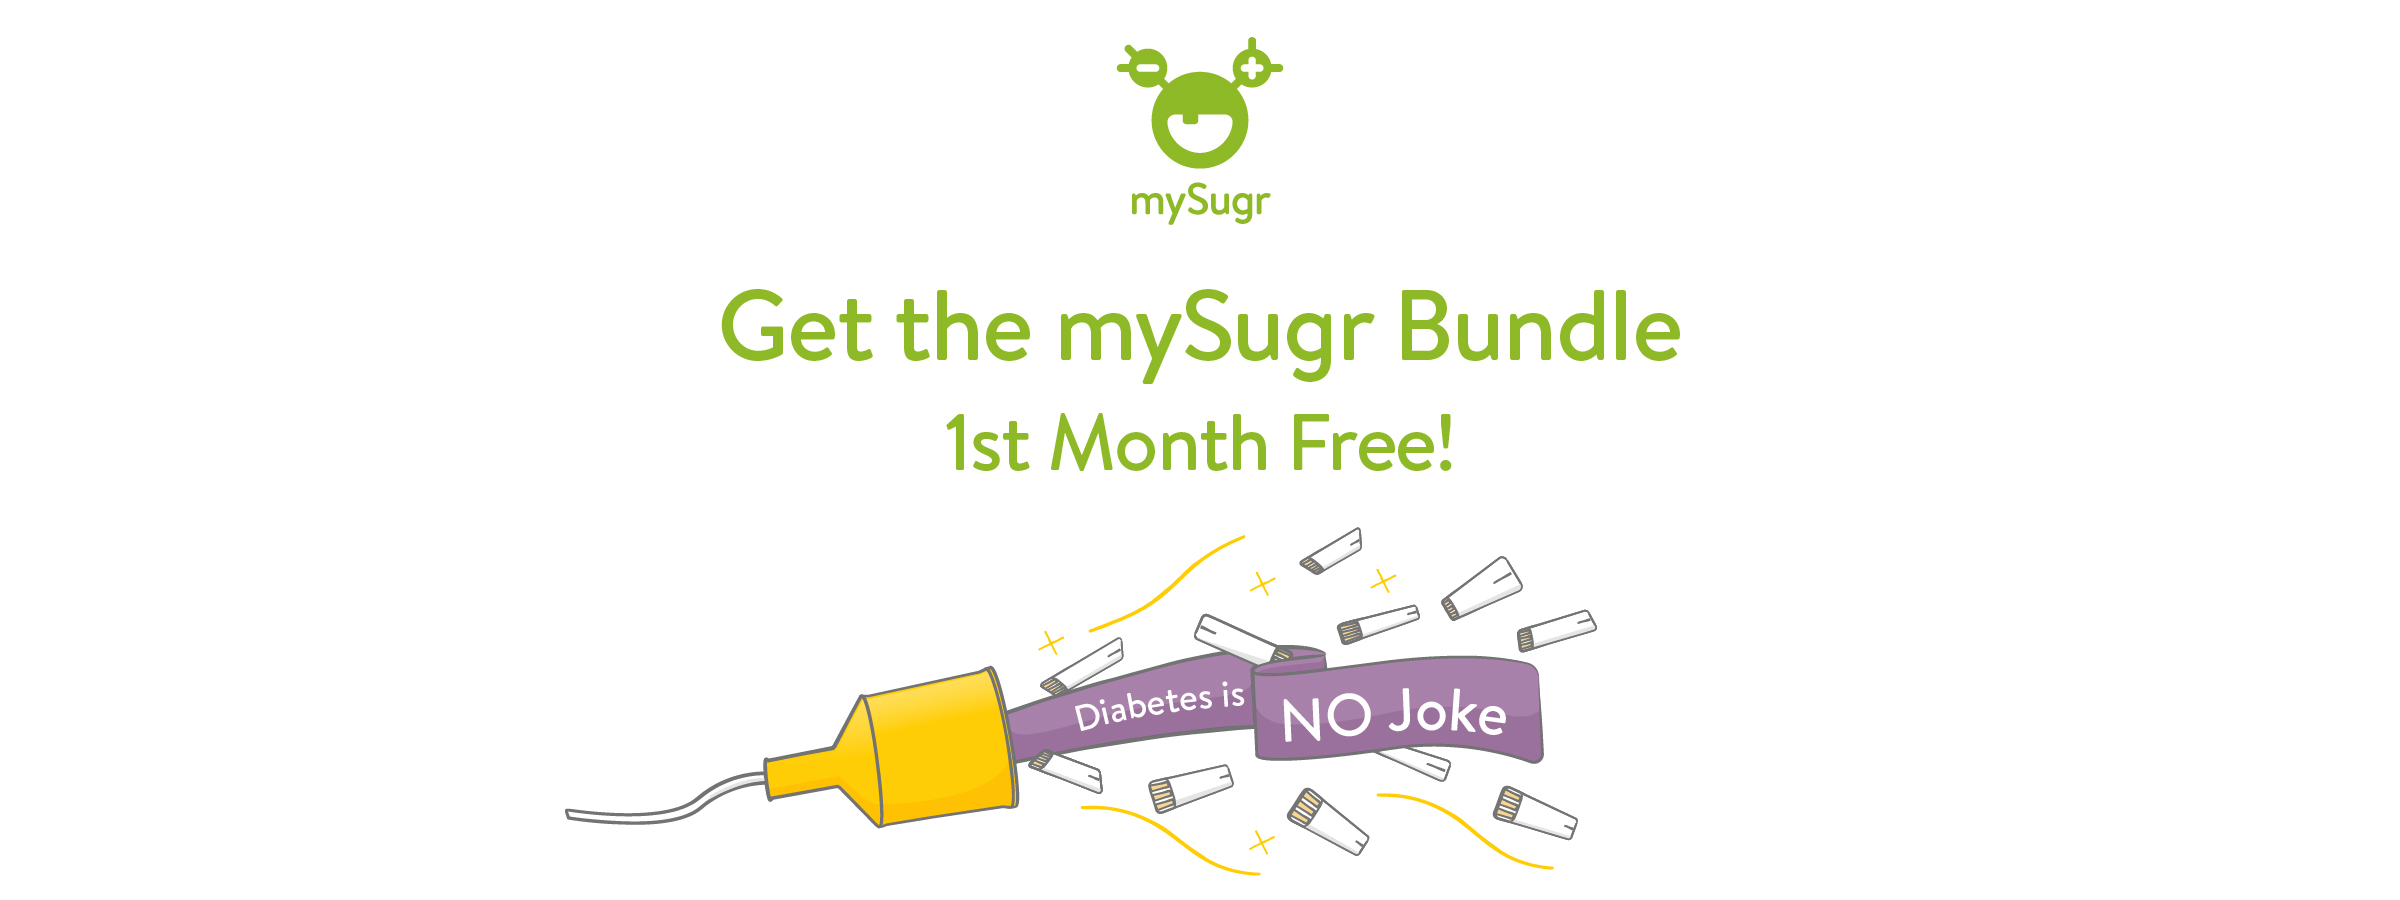 Diabetes is no joke - mySugr Bundle promotion